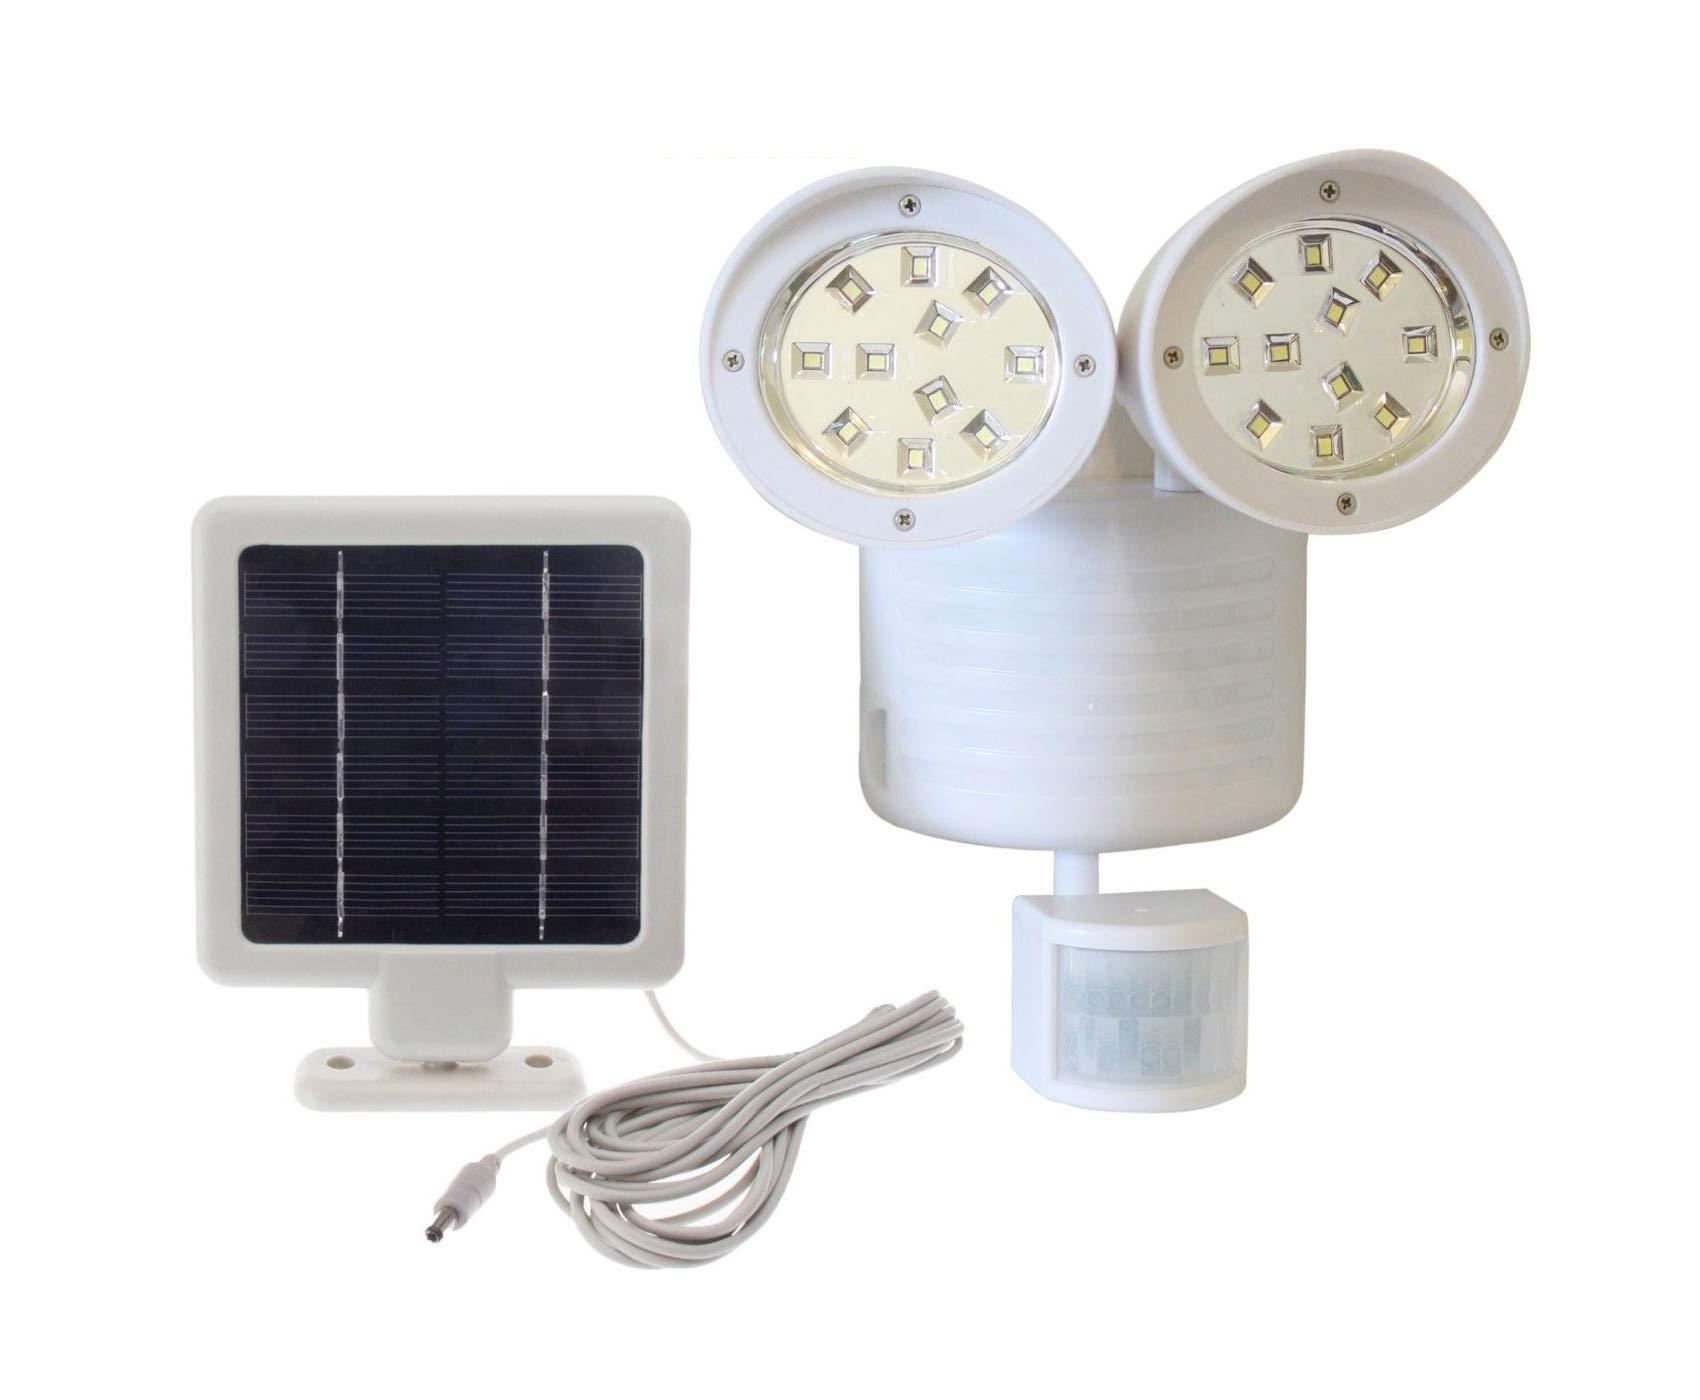 Upgrade Solar Powered Motion Sensor Lights 22 SMD Garage Outdoor Security Flood Spot Light (White)